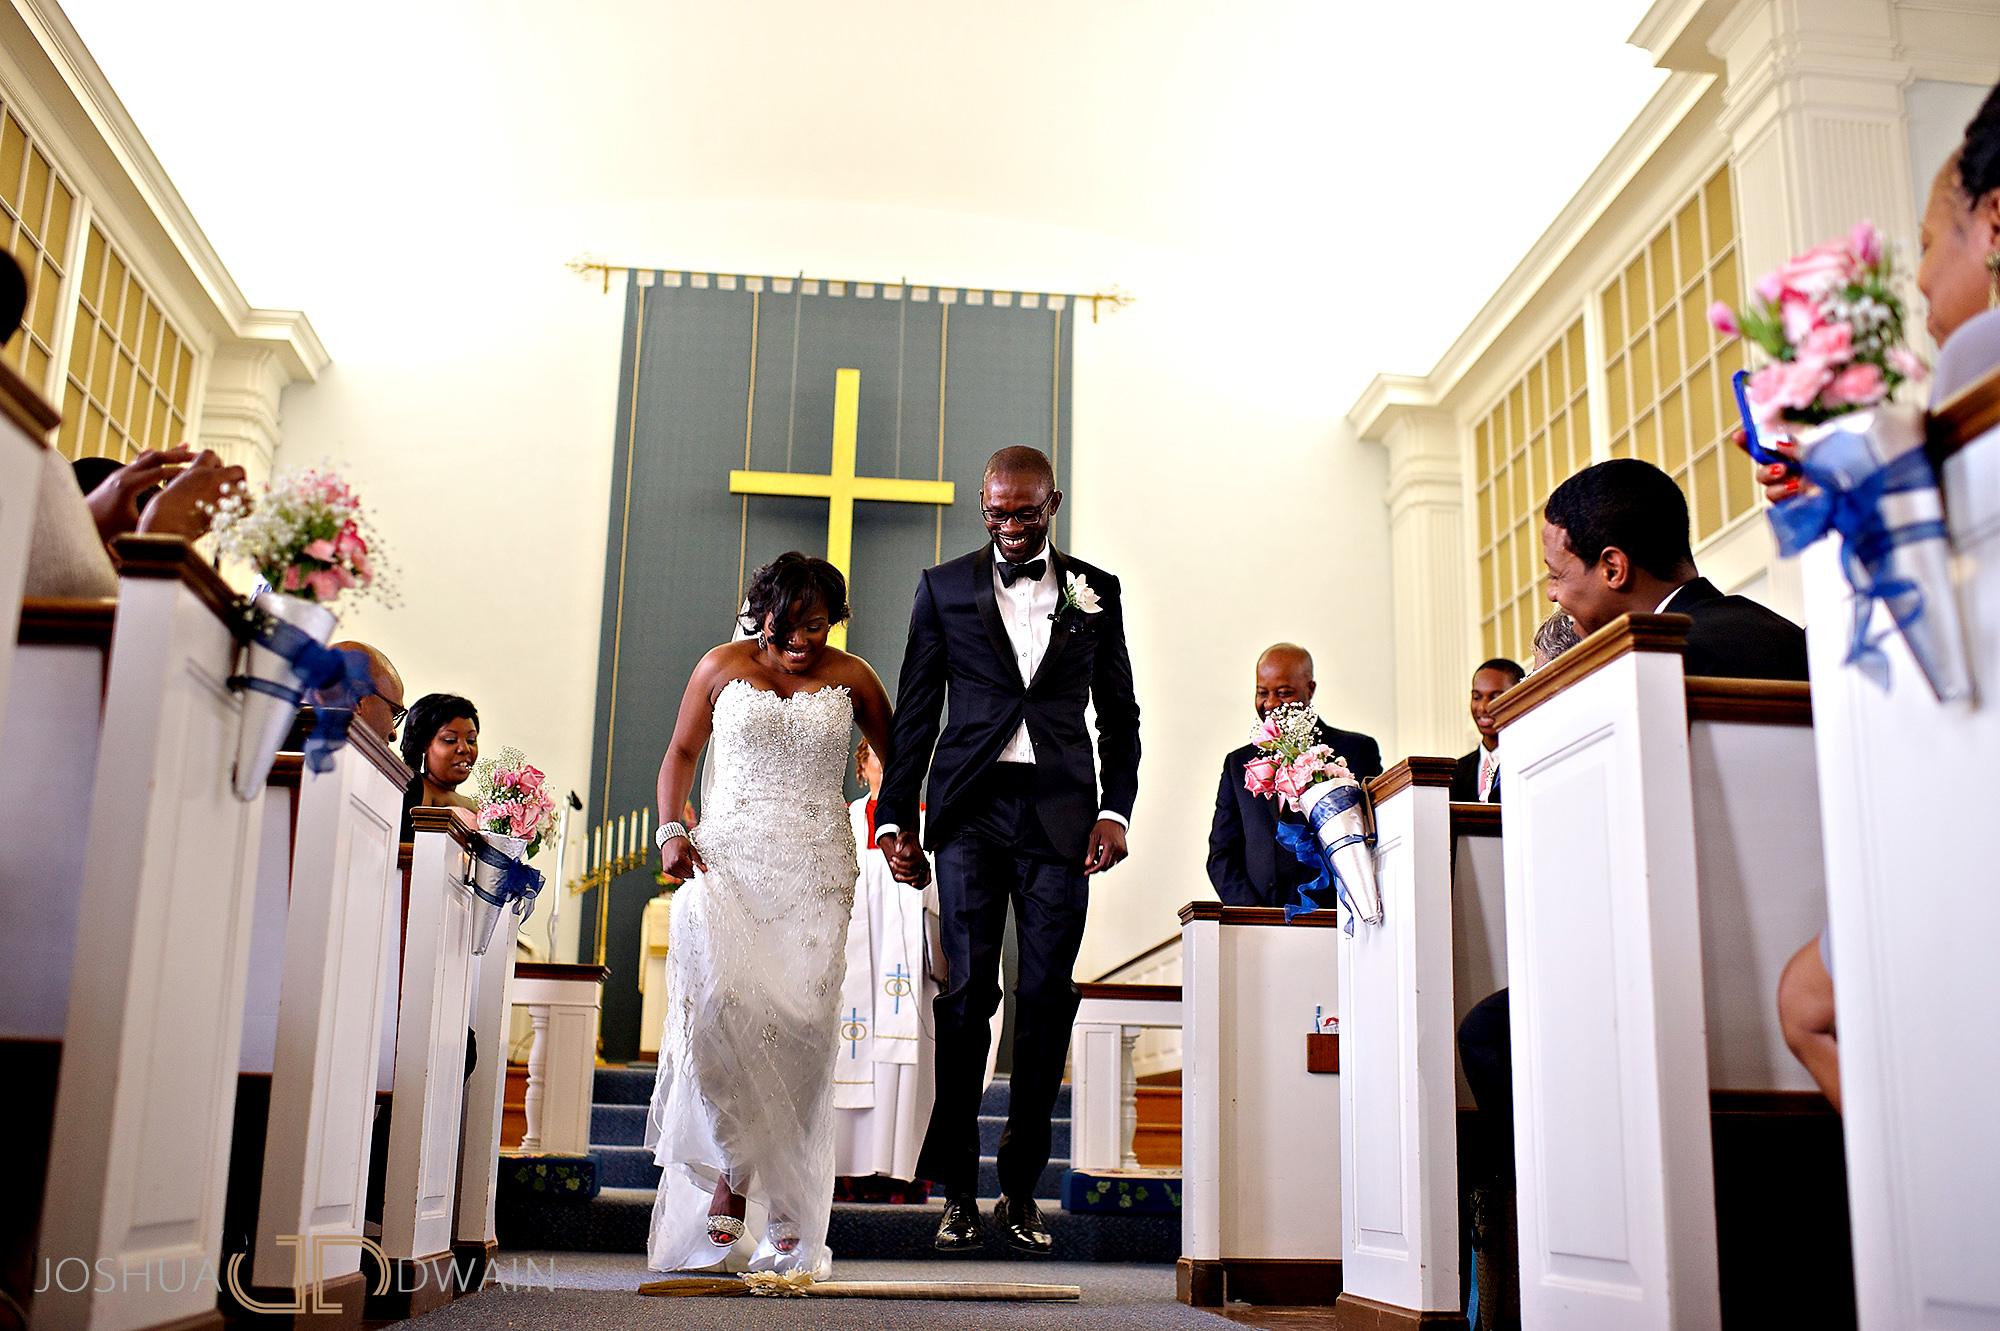 tiffany-udo-008-tendenza-philadelphia-pa-wedding-photographer-joshua-dwain-photography-